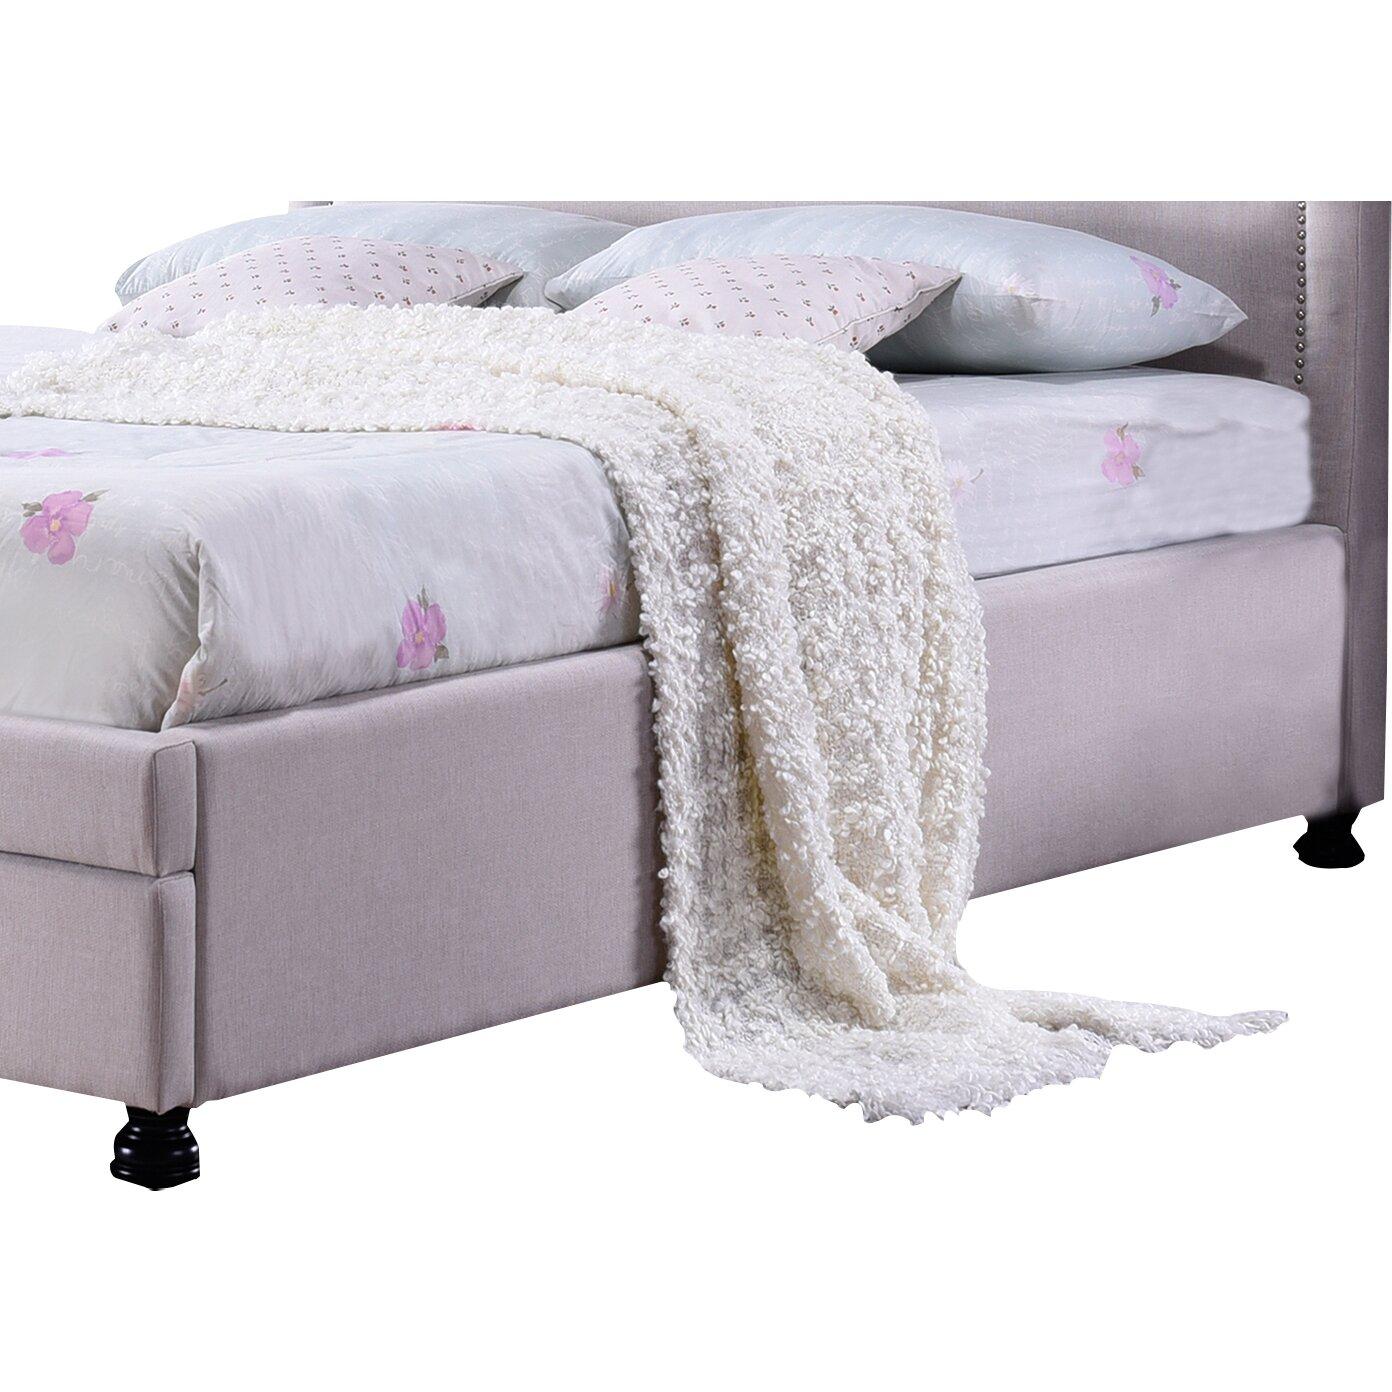 Wholesale Interiors Baxton Studio King Upholstered Storage Platform Bed Reviews Wayfair